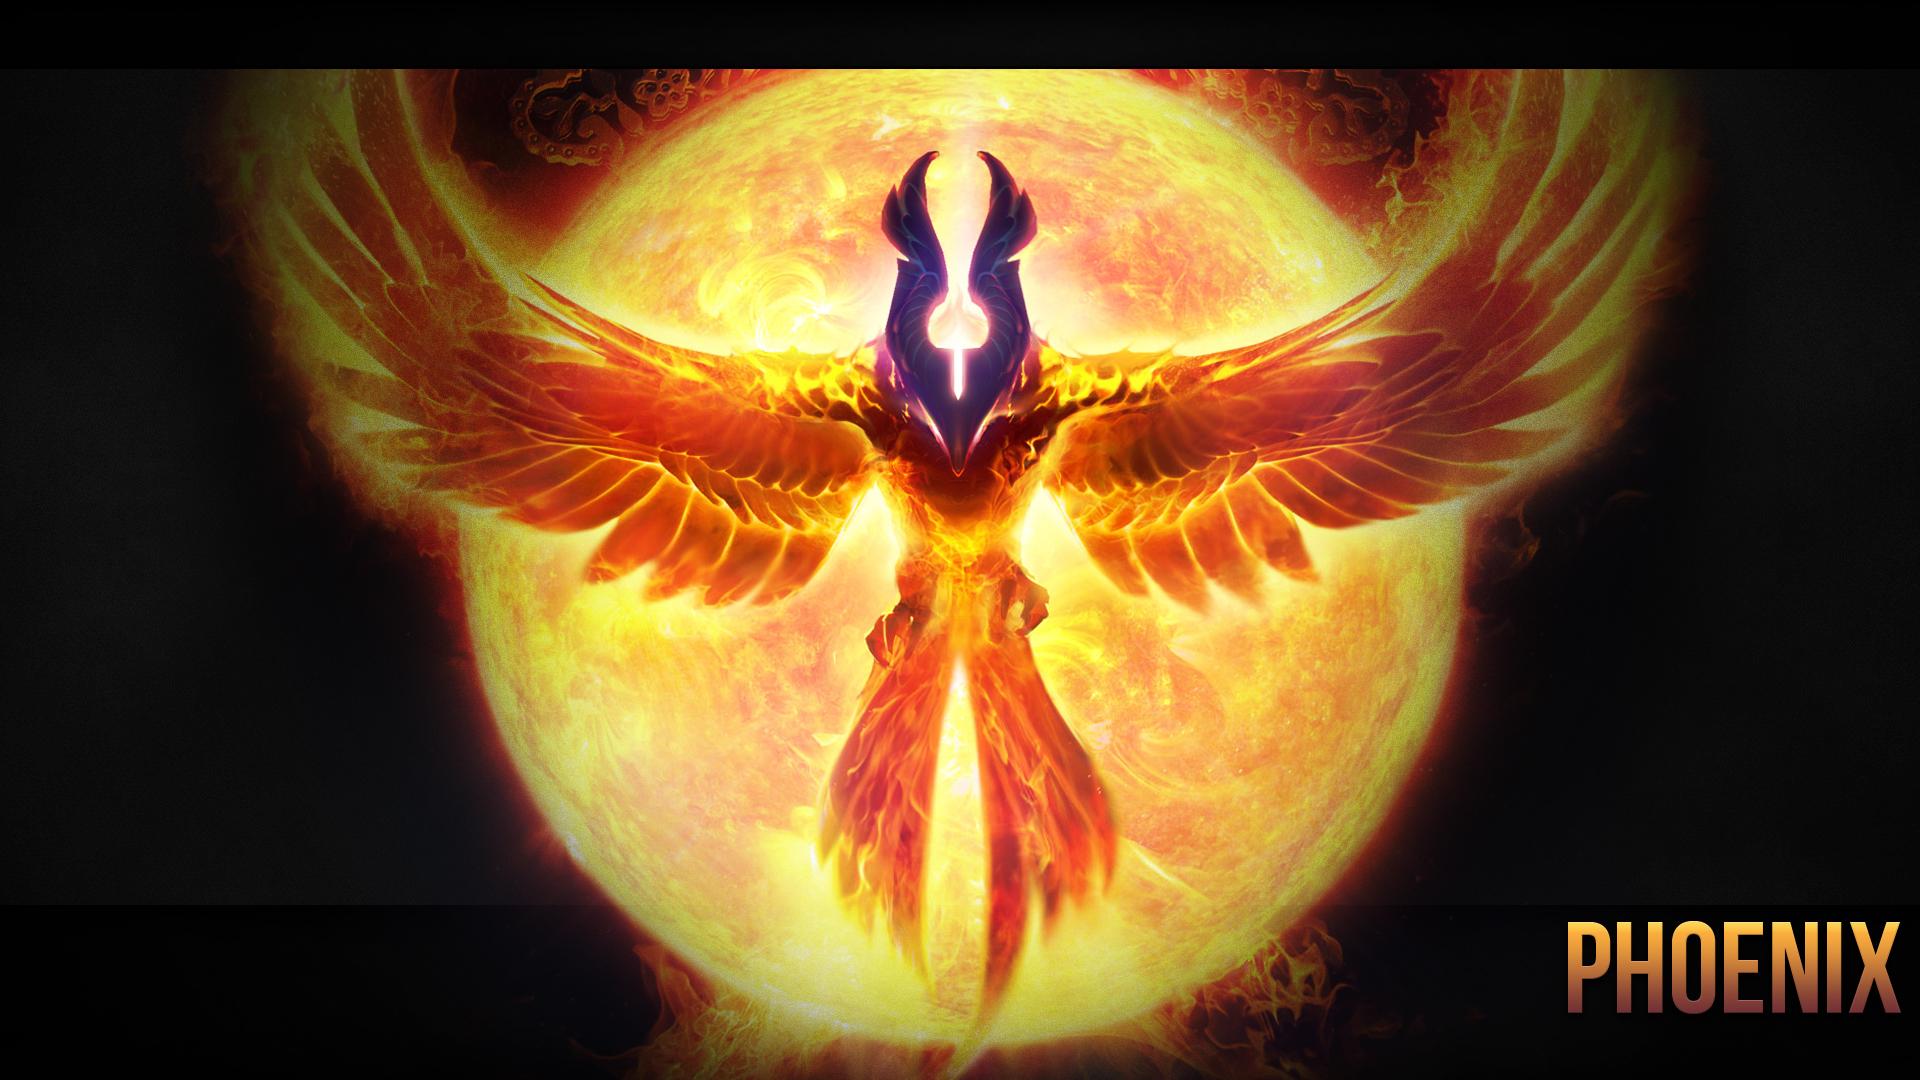 Phoenix wallpaper by imkb on deviantart - Photo de phenix ...